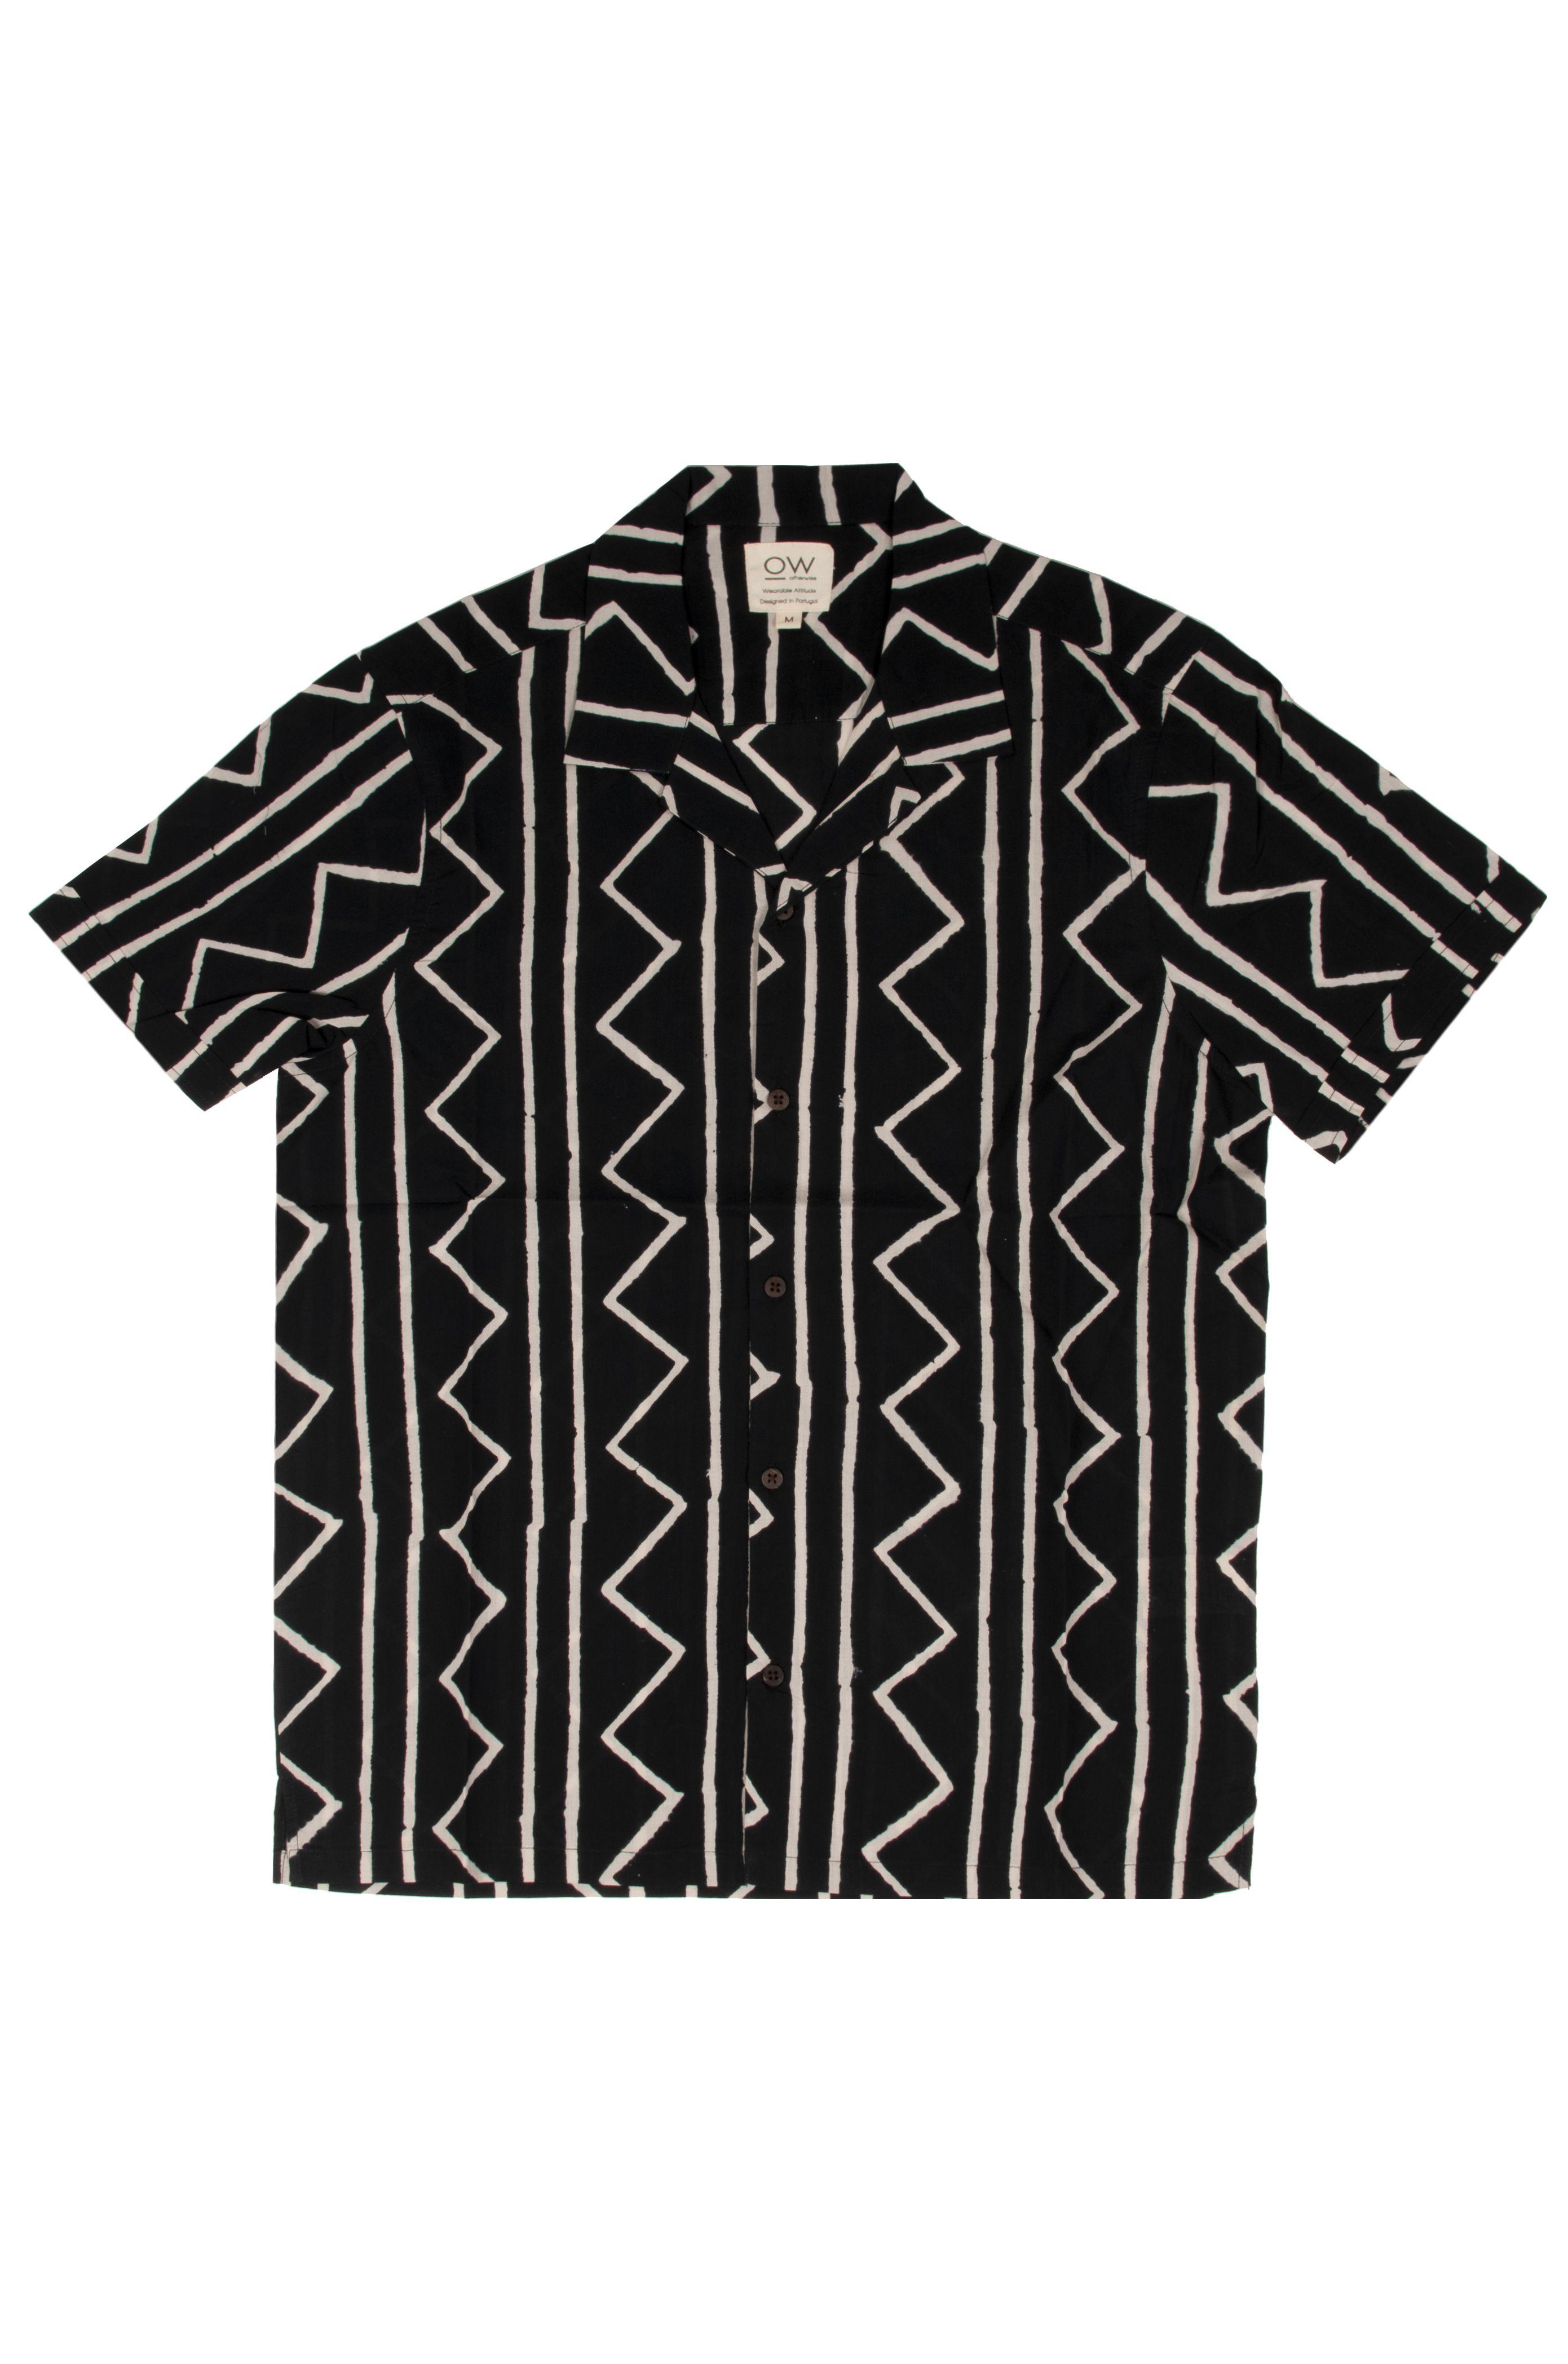 Camisa Otherwise J041 Black/White